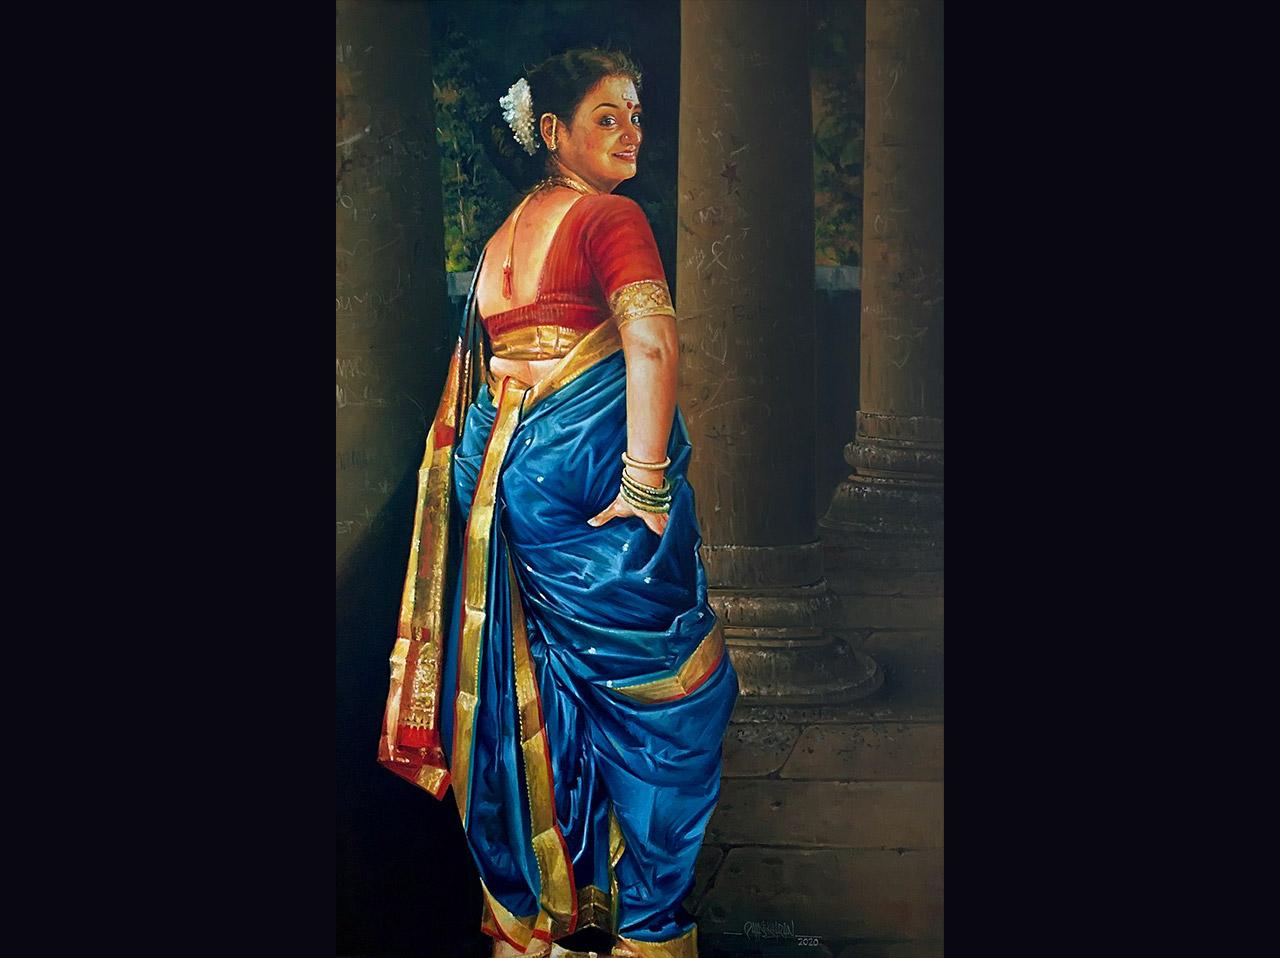 Traditional-Dresses-of-Maharashtra-Nauvari-Saree